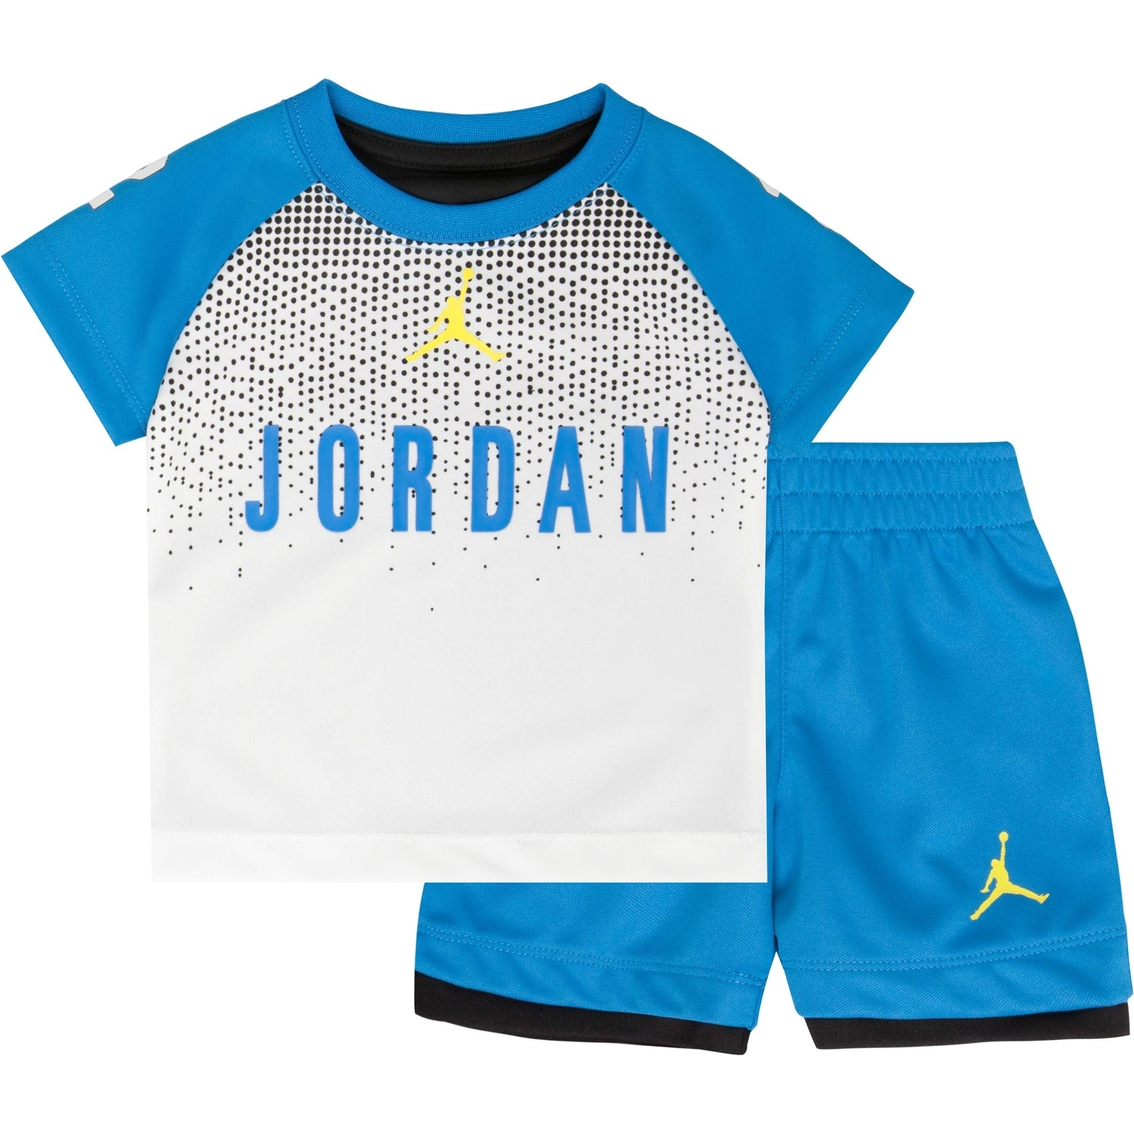 38f94c7256f Jordan Infant Boys 2 Pc. Tricot Tee And Shorts Set   Baby Boy 0-24 ...